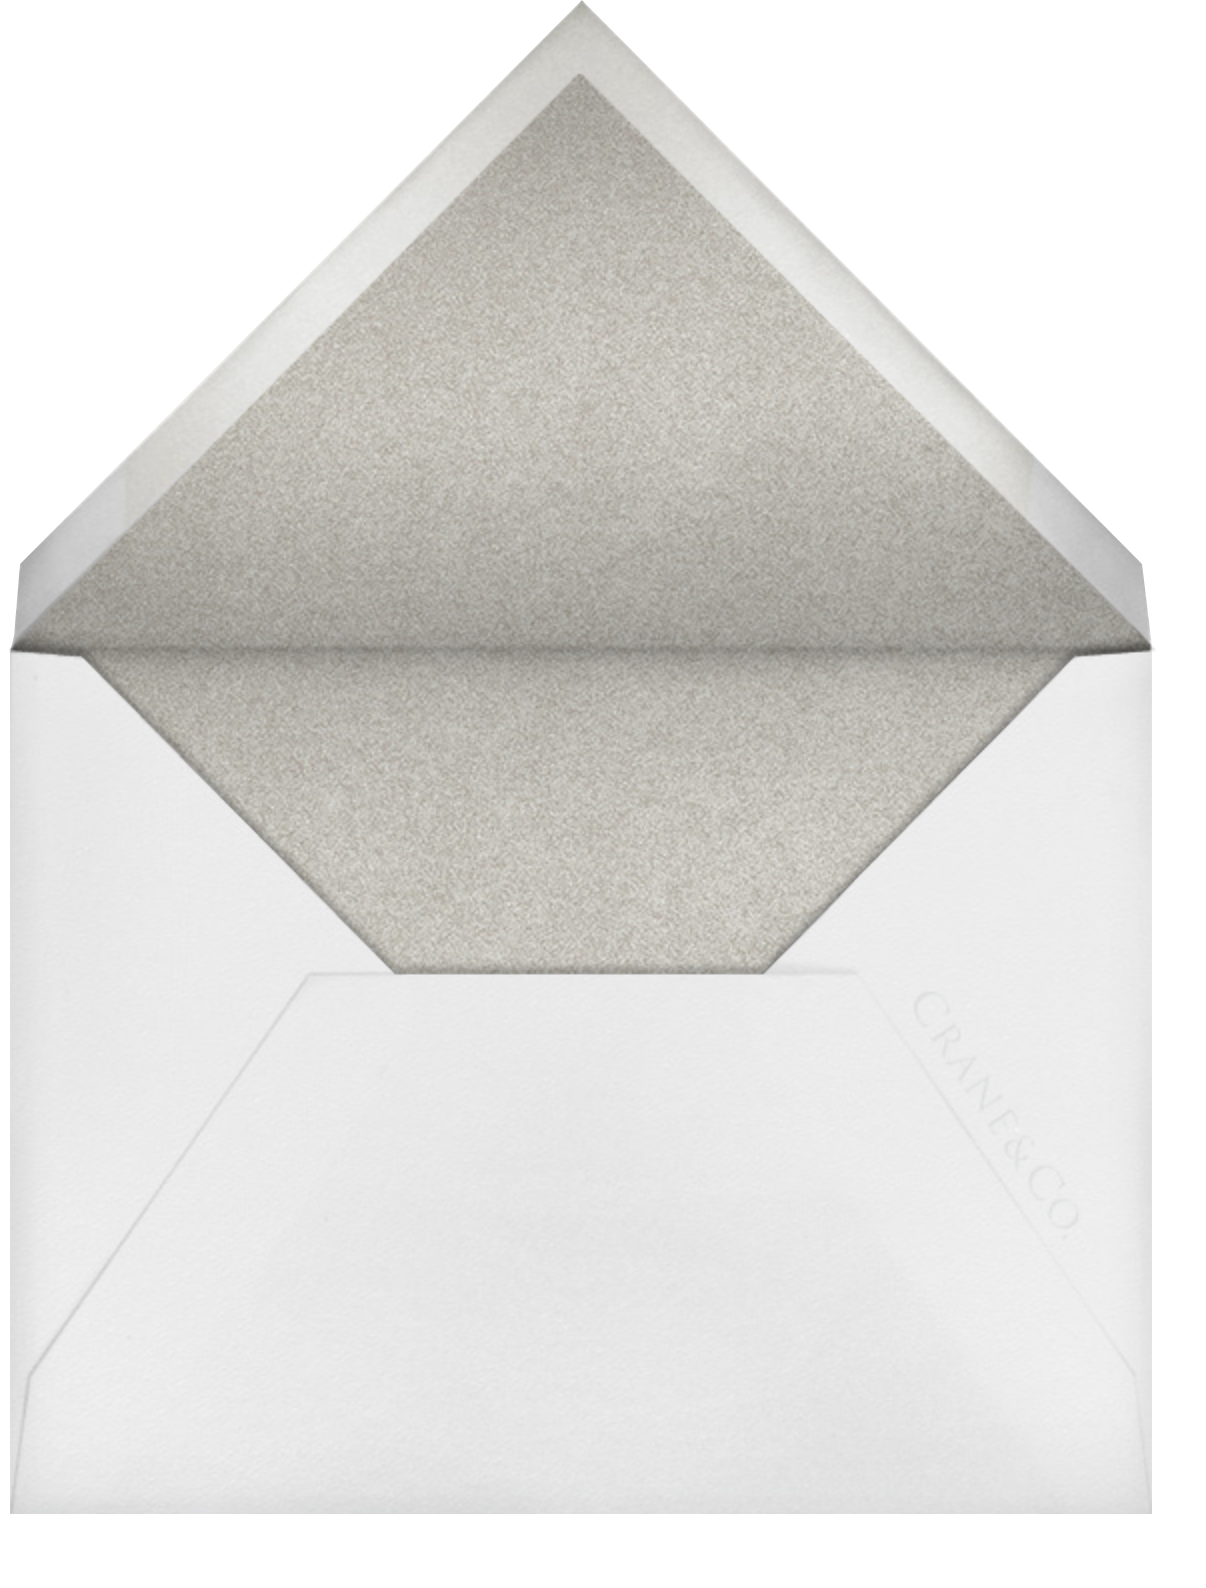 Revel - Newport Blue - Vera Wang - Engagement party - envelope back